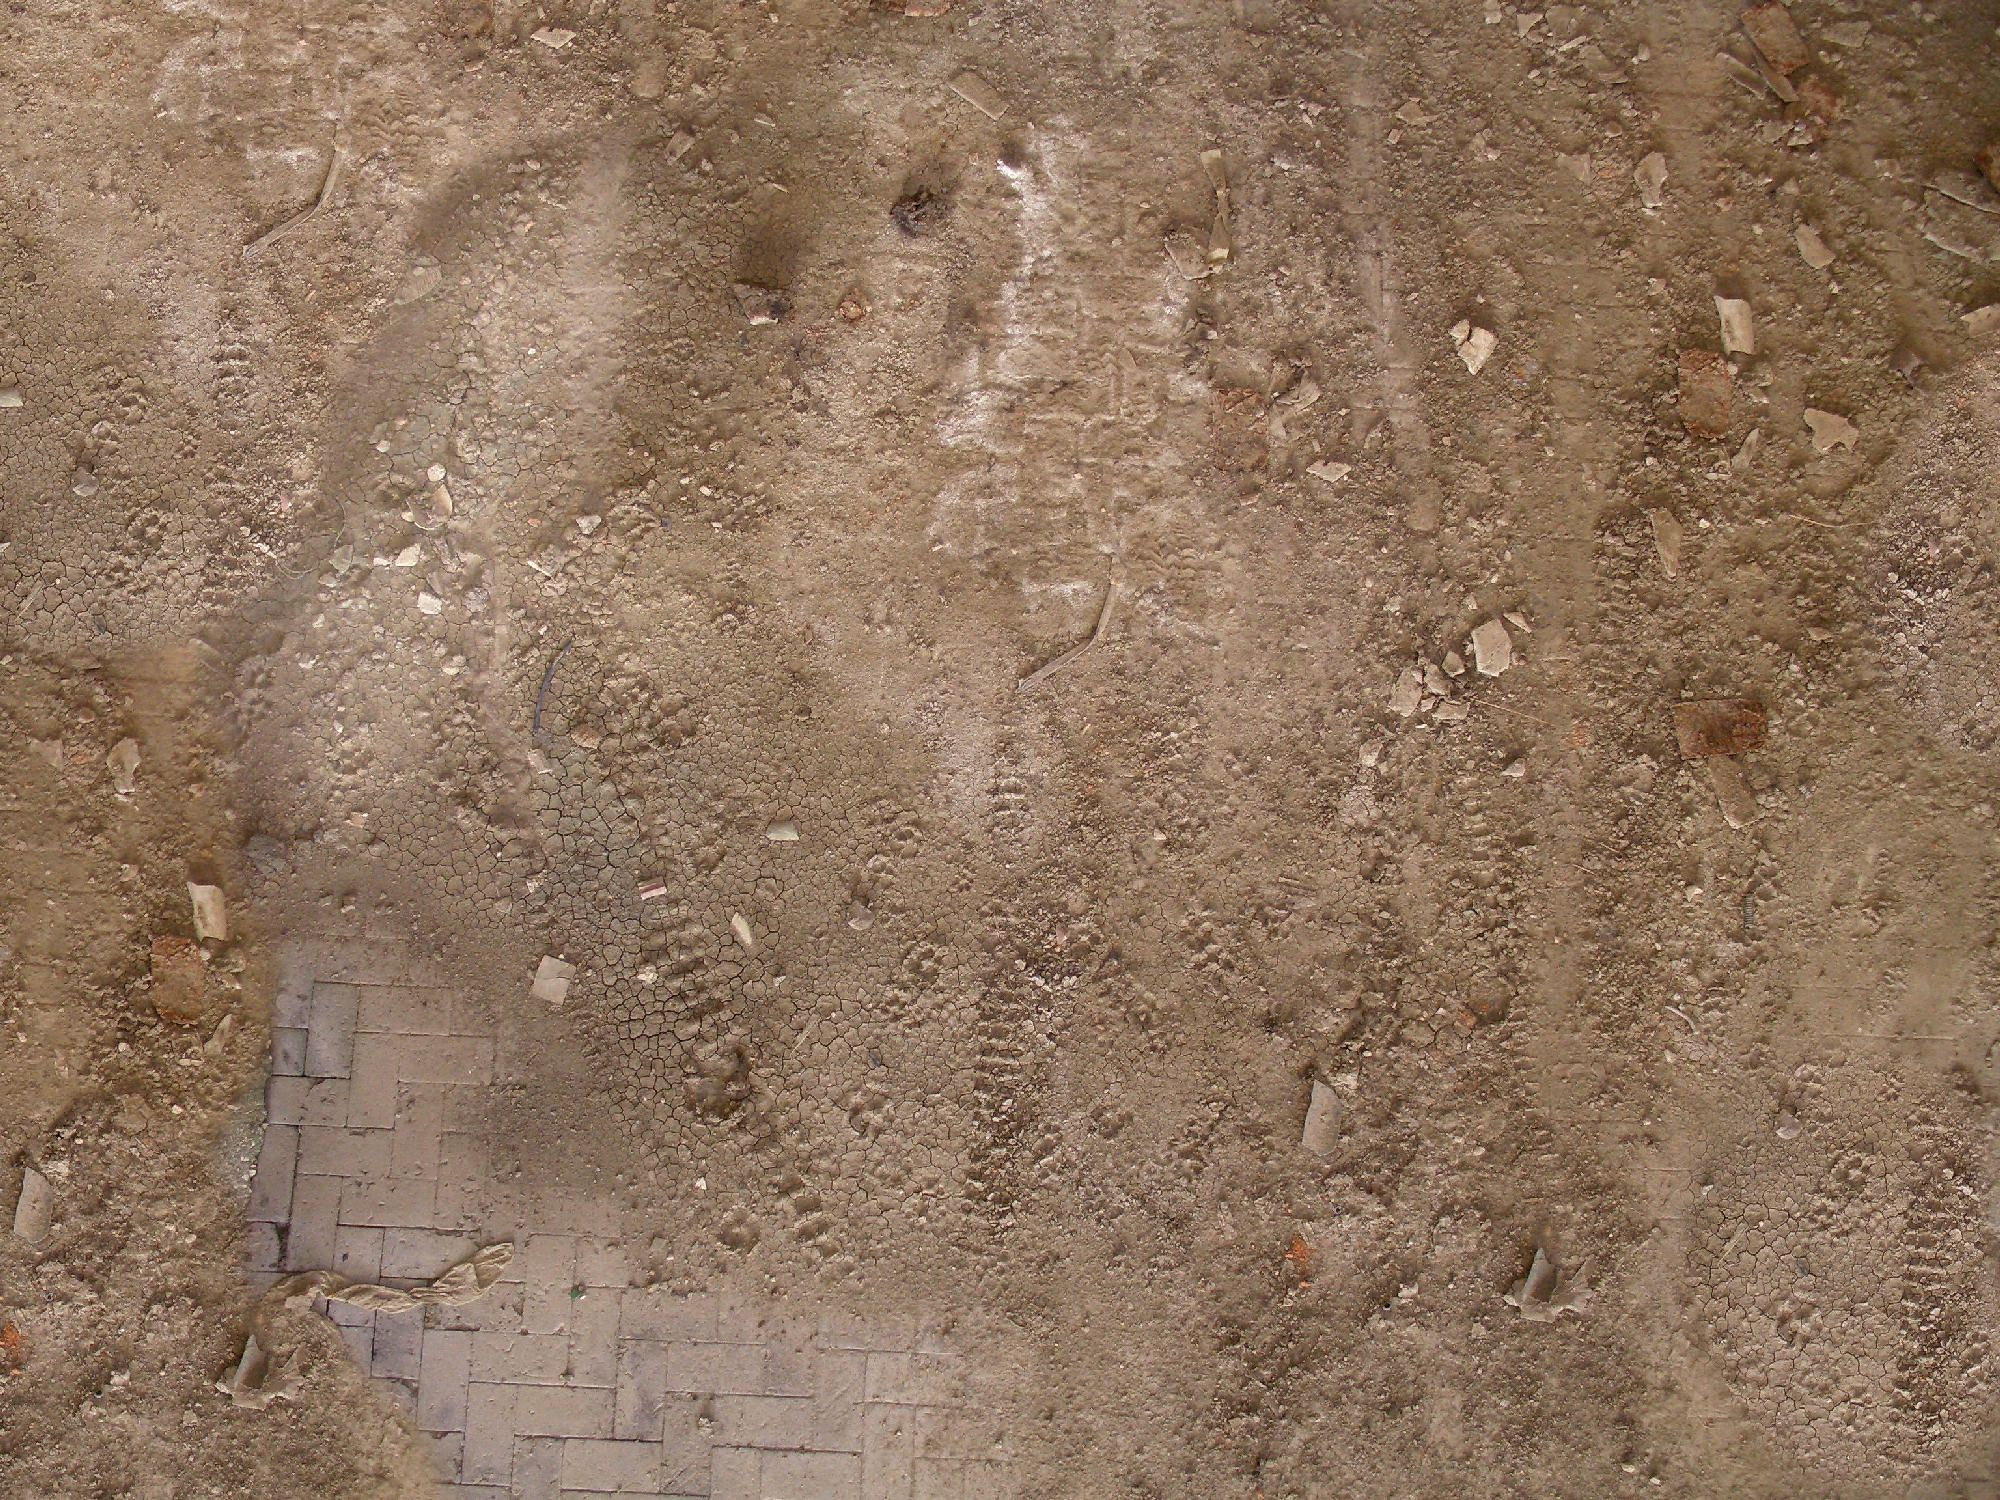 Dirt Ground Texture Example 2 Texture Pinterest